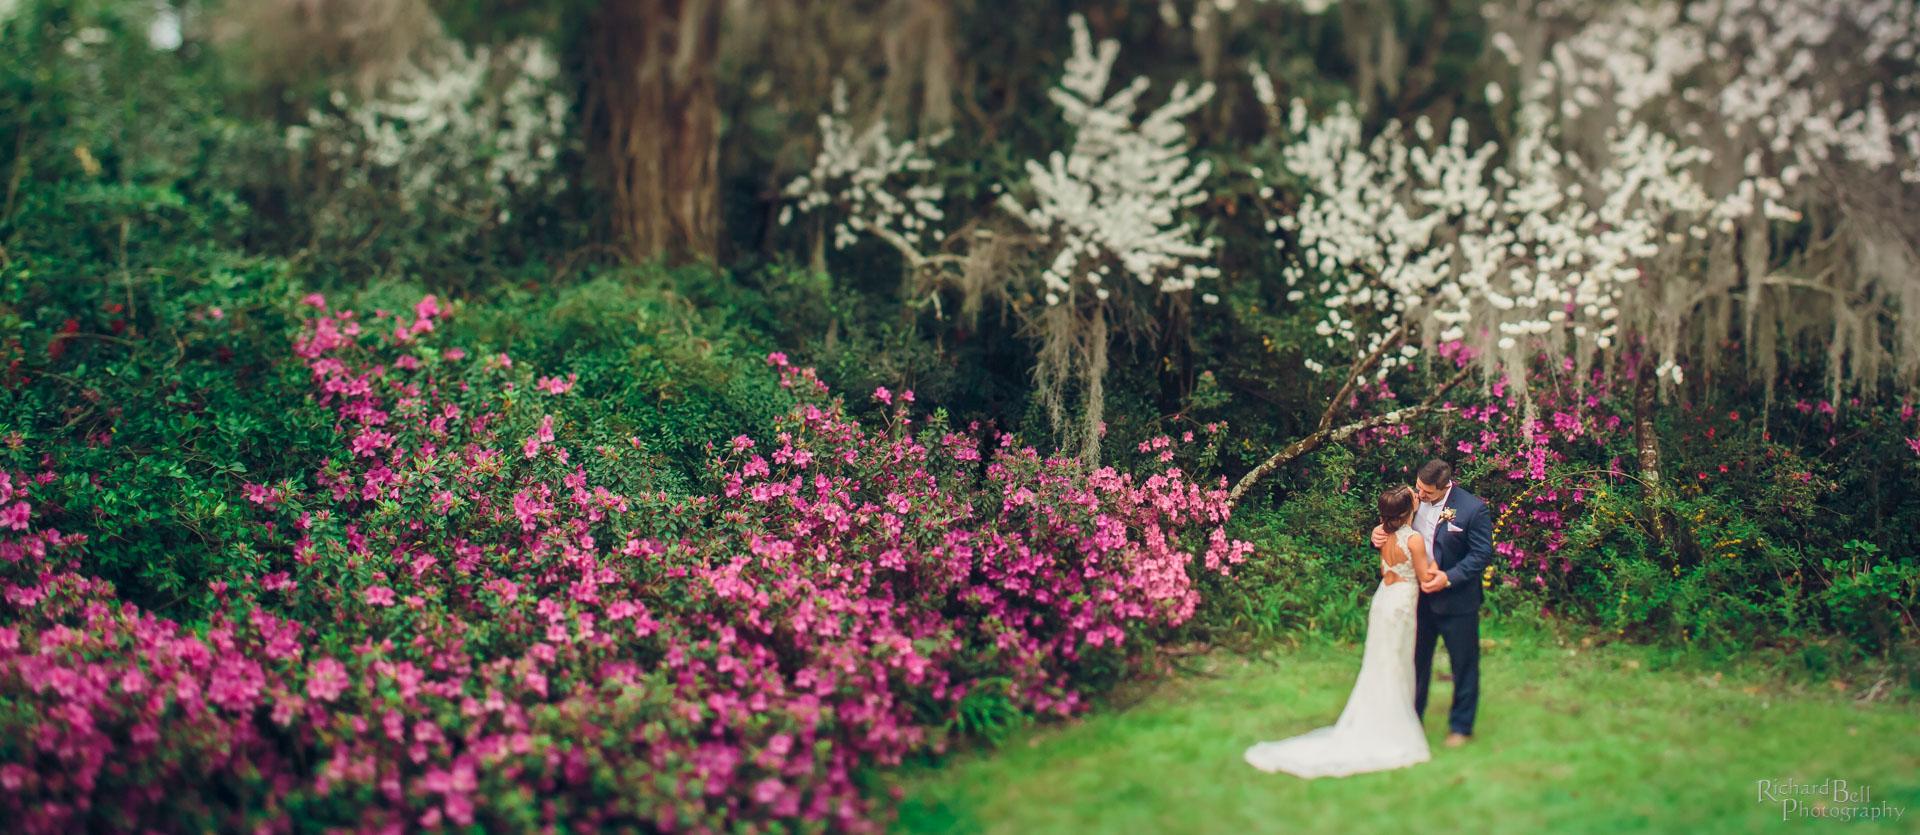 Bride and Groom at Magnolia Plantation